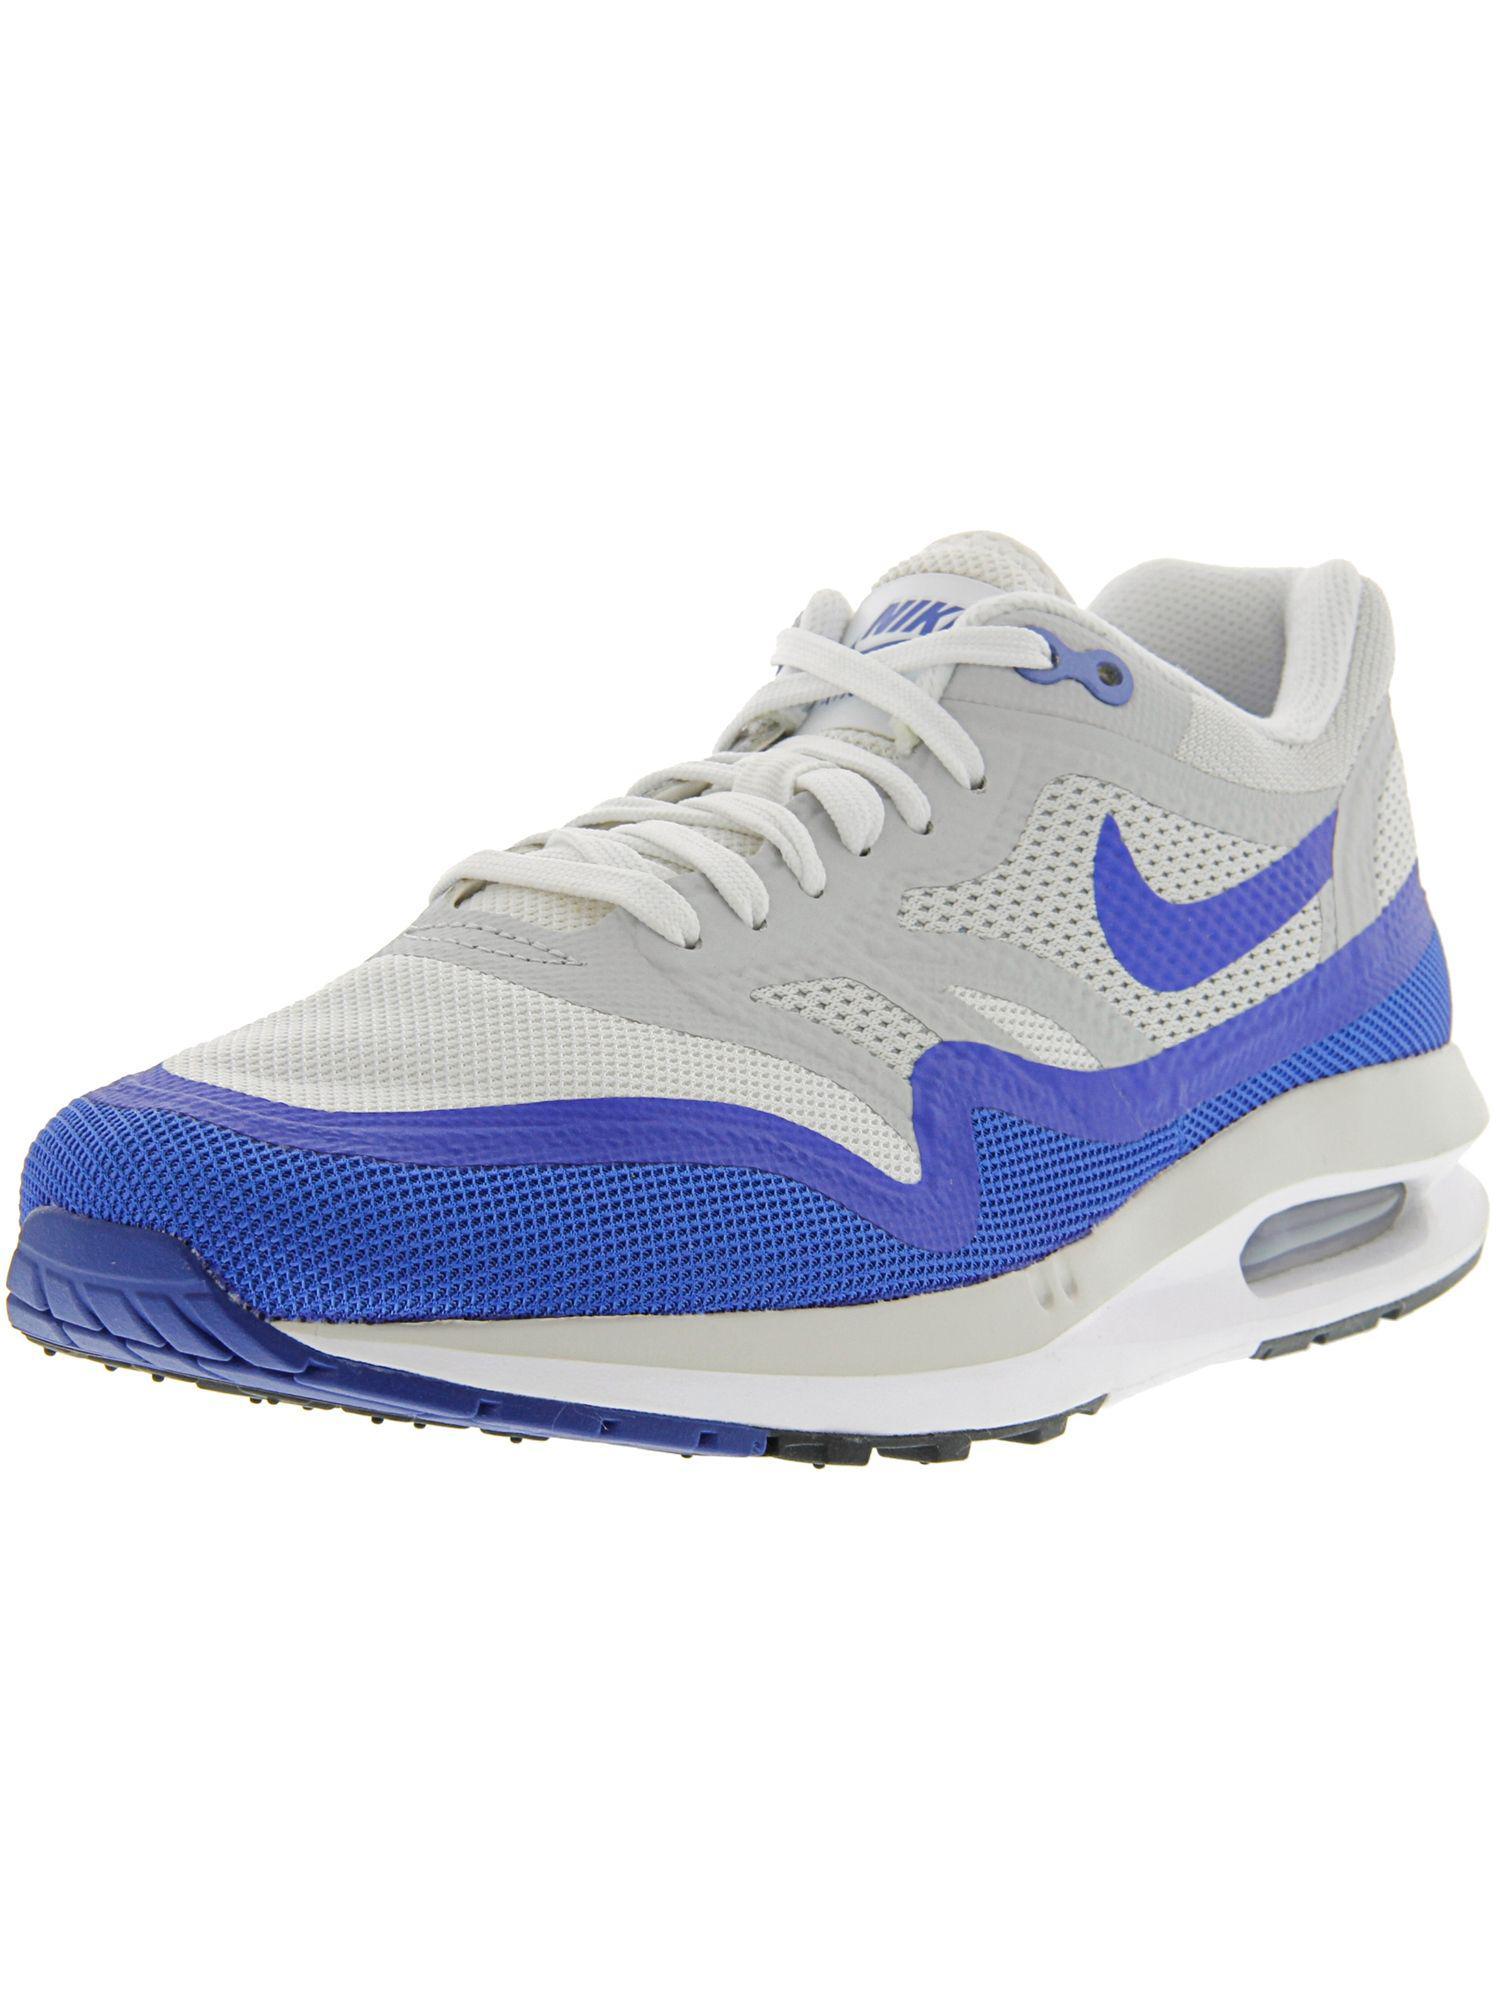 wholesale dealer 24670 d7751 Nike. White Women s Air Max Lunar 1 ...